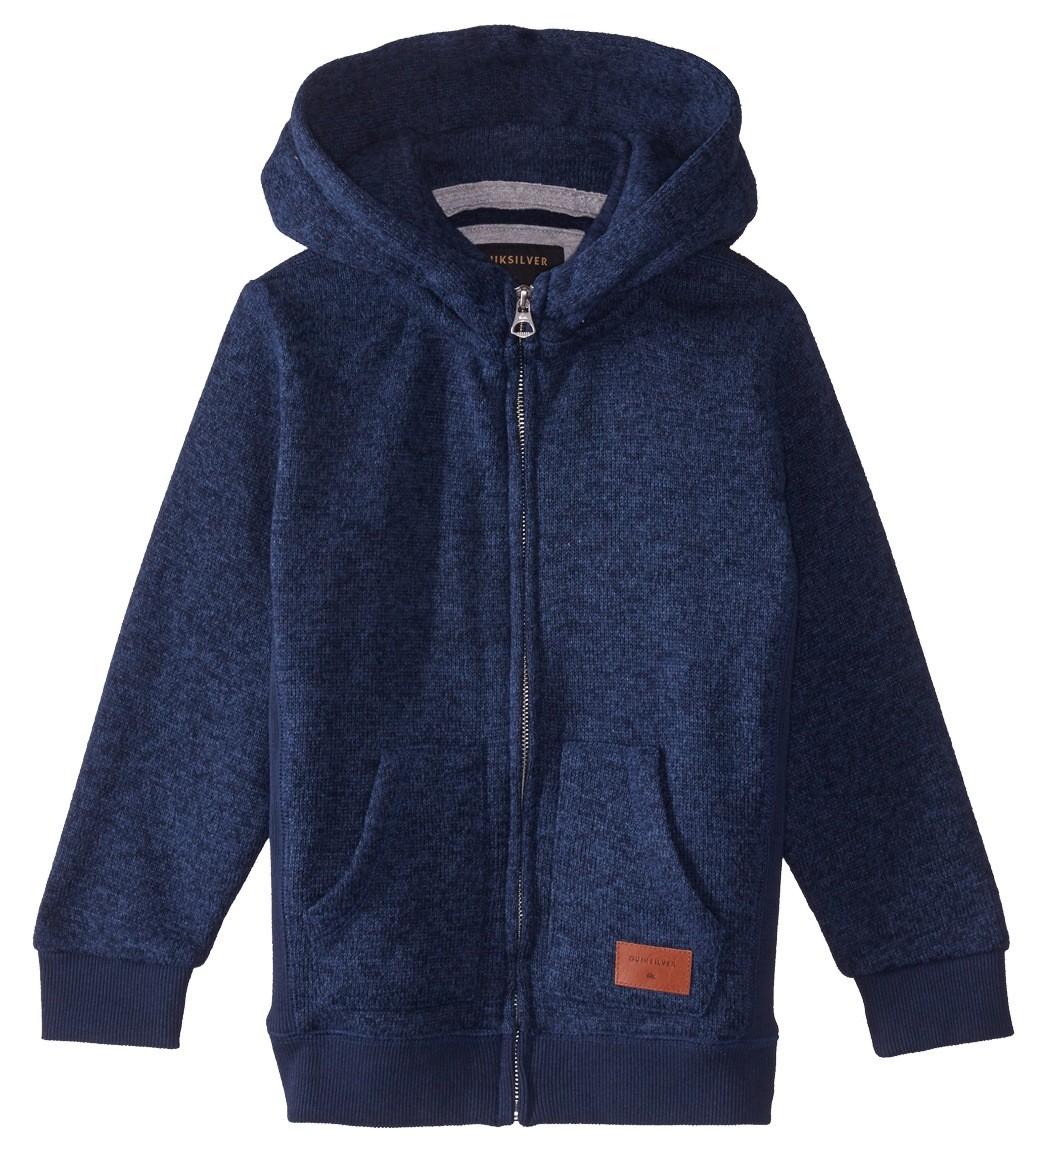 9d6dd8c2e9 Quiksilver Boys' Keller Brushed Fleece Zip Hoodie (Little Kid)